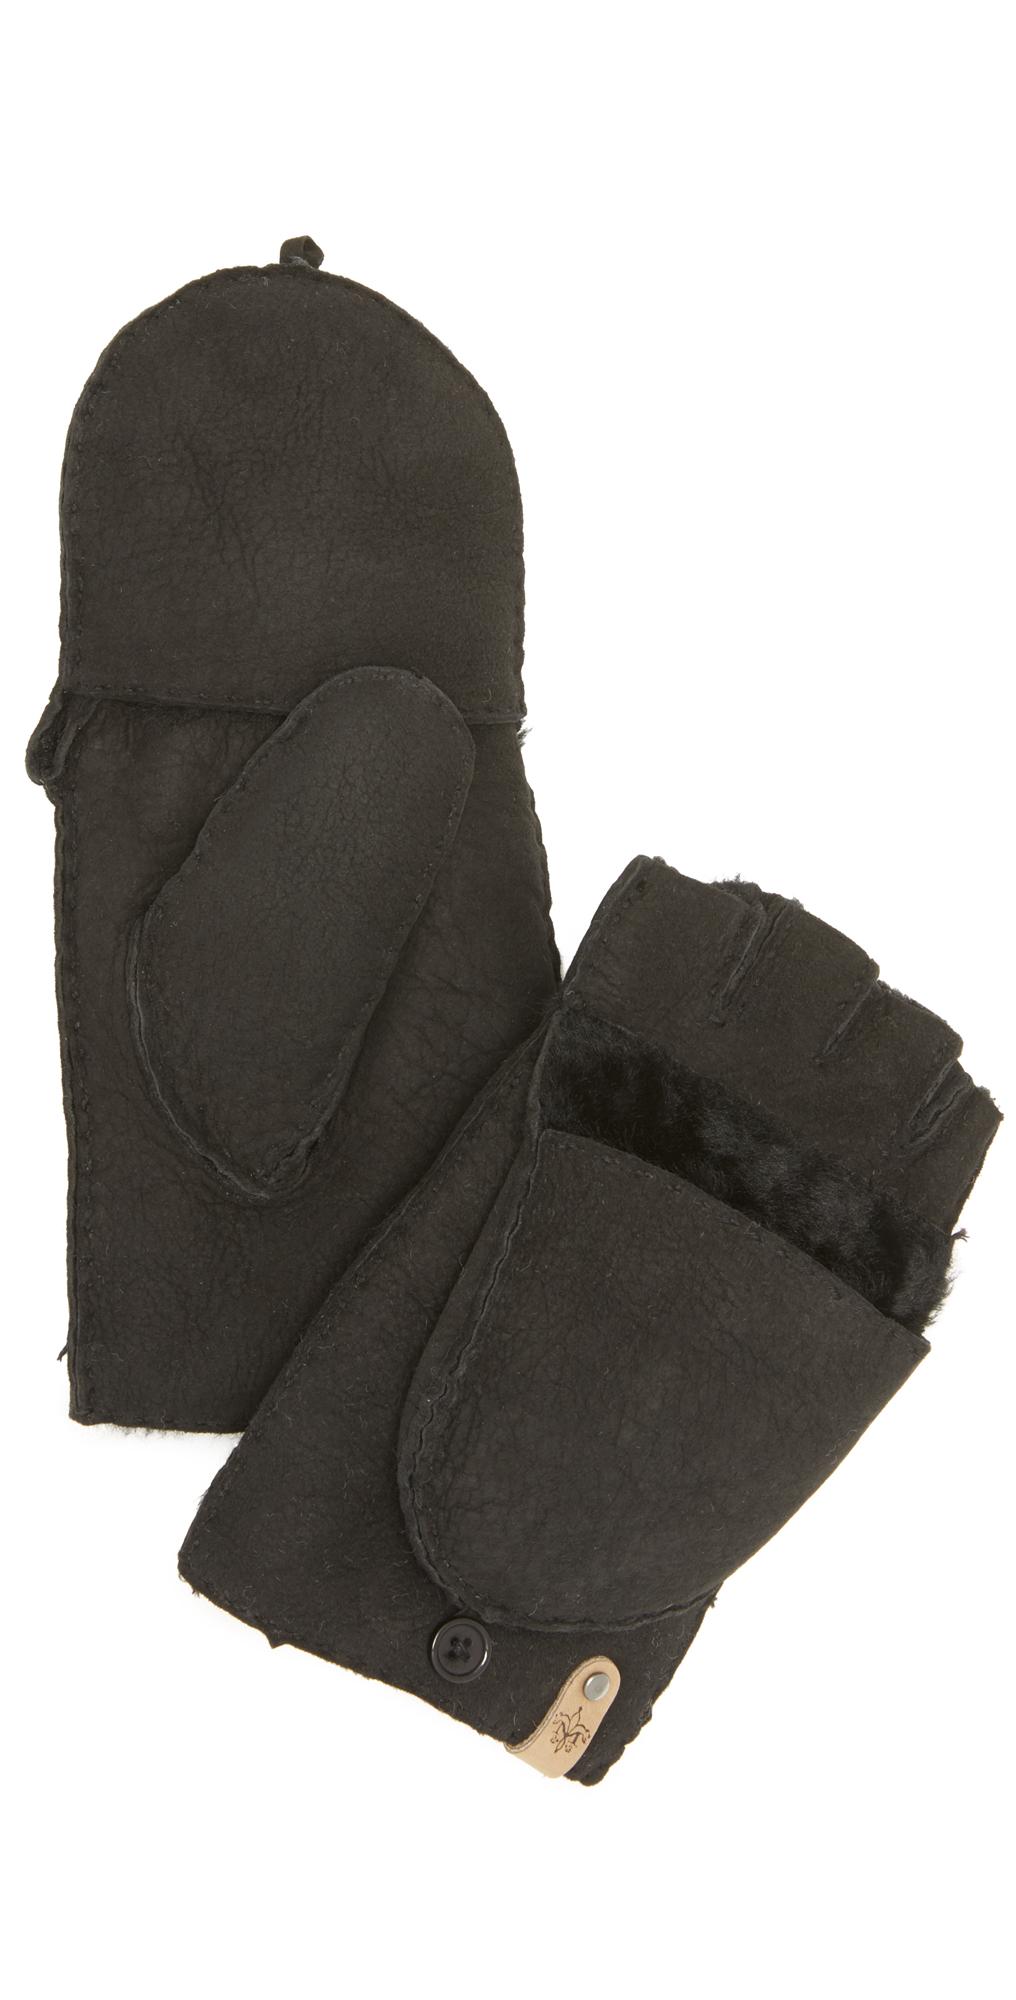 Mackage Orea Texting Gloves